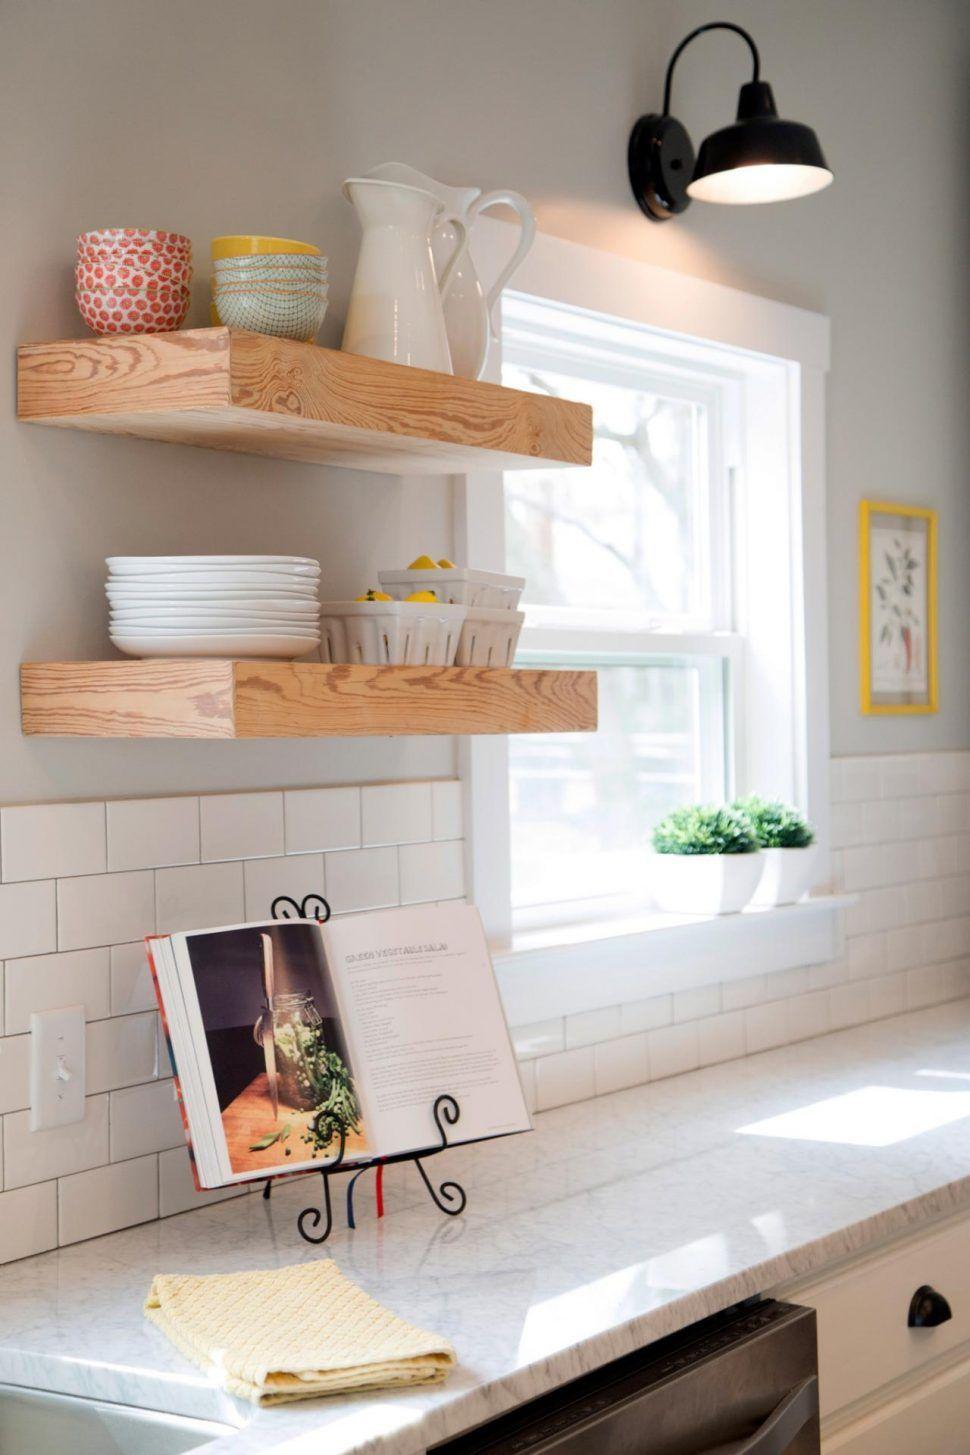 KitchenModern Floating Shelves For Kitchen Diy 15 Modern